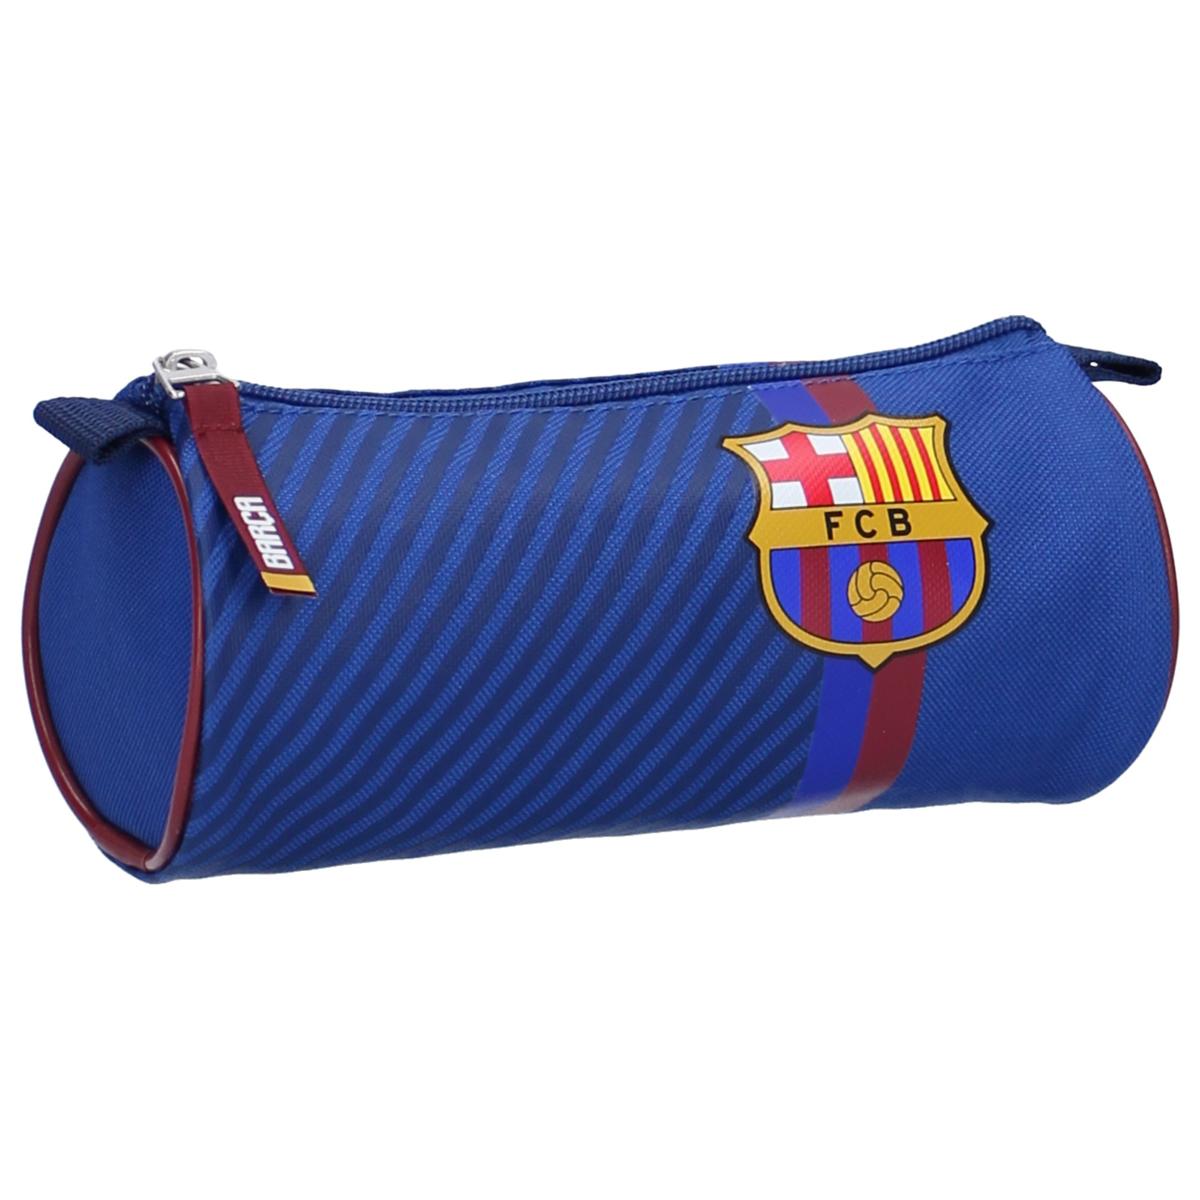 Trousse tube \'FC Barcelona\' bleu rouge - 20x9 cm - [A0067]